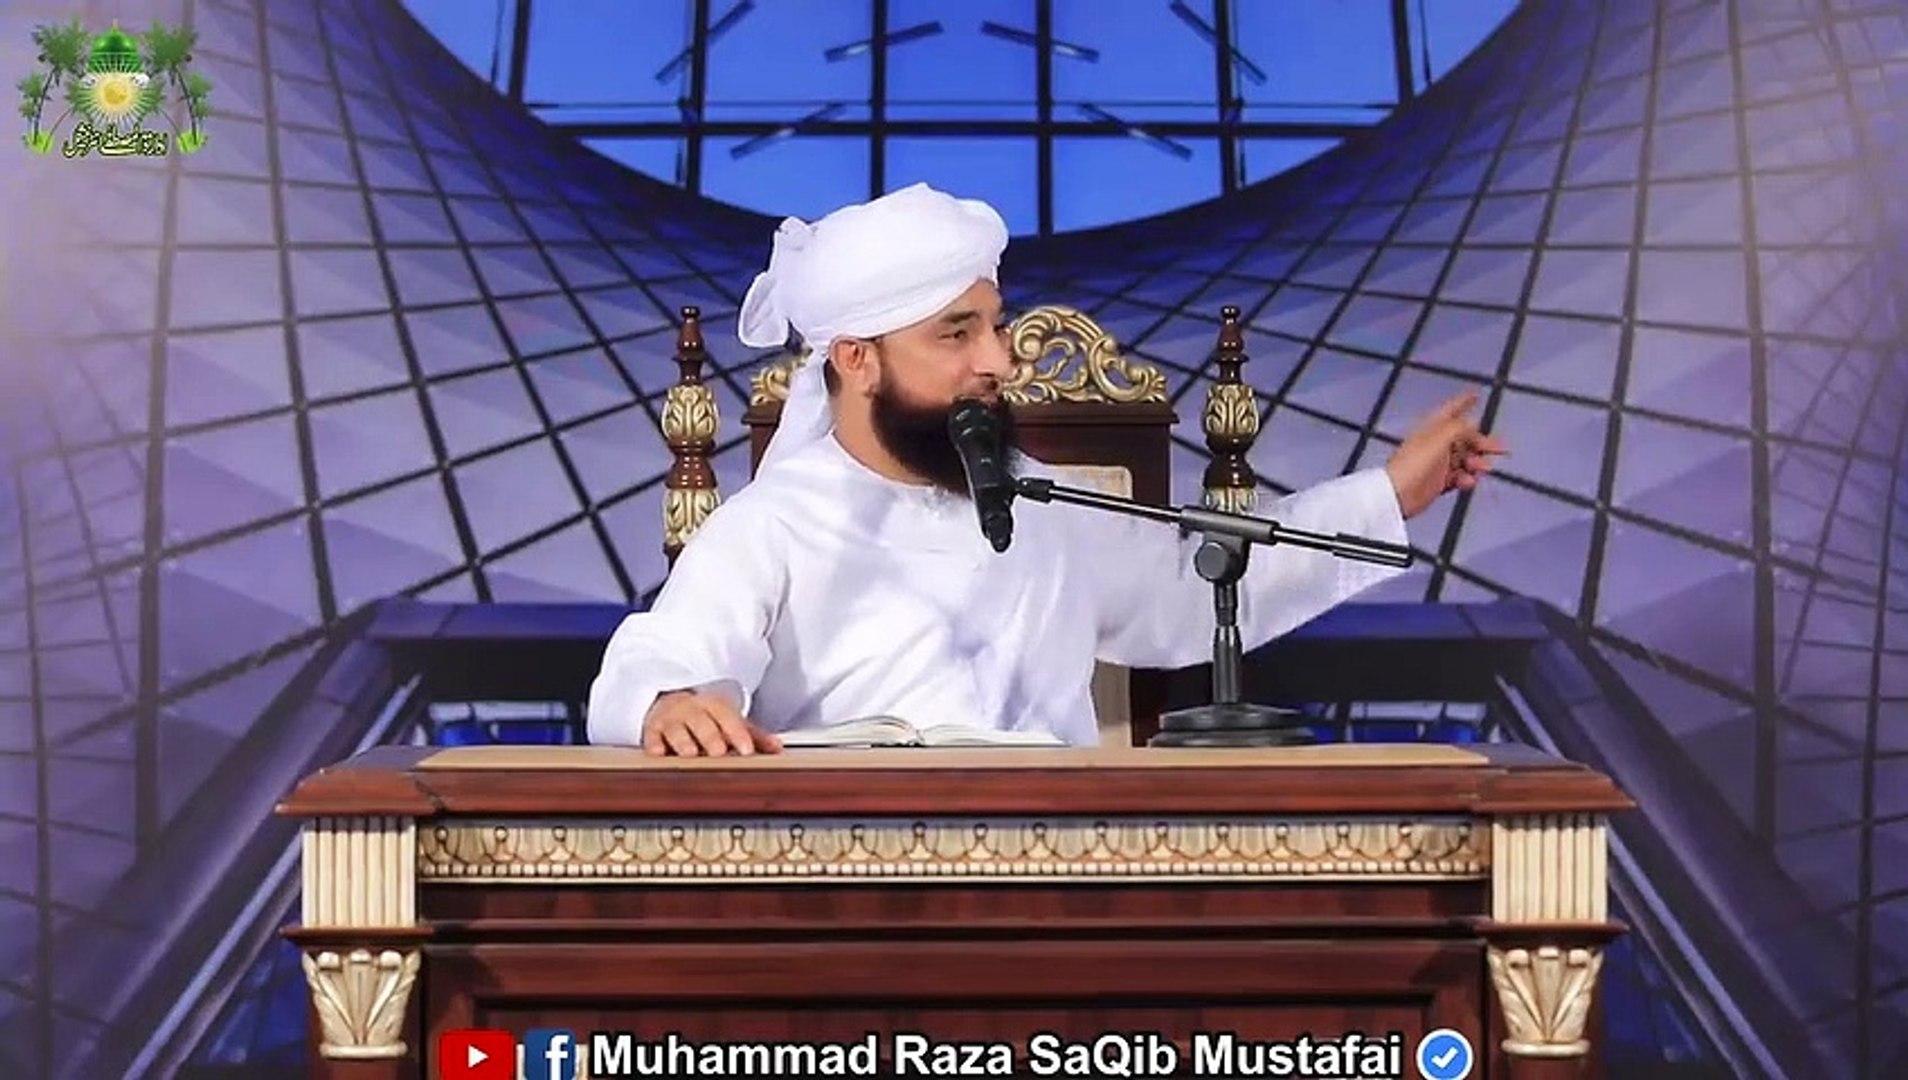 Hazrat MUSA or Hazrat KHIZAR ka Dilchasb Waqia ! حضرت موسیٰ اور حضرت خضر کا دلچسب واقعہ